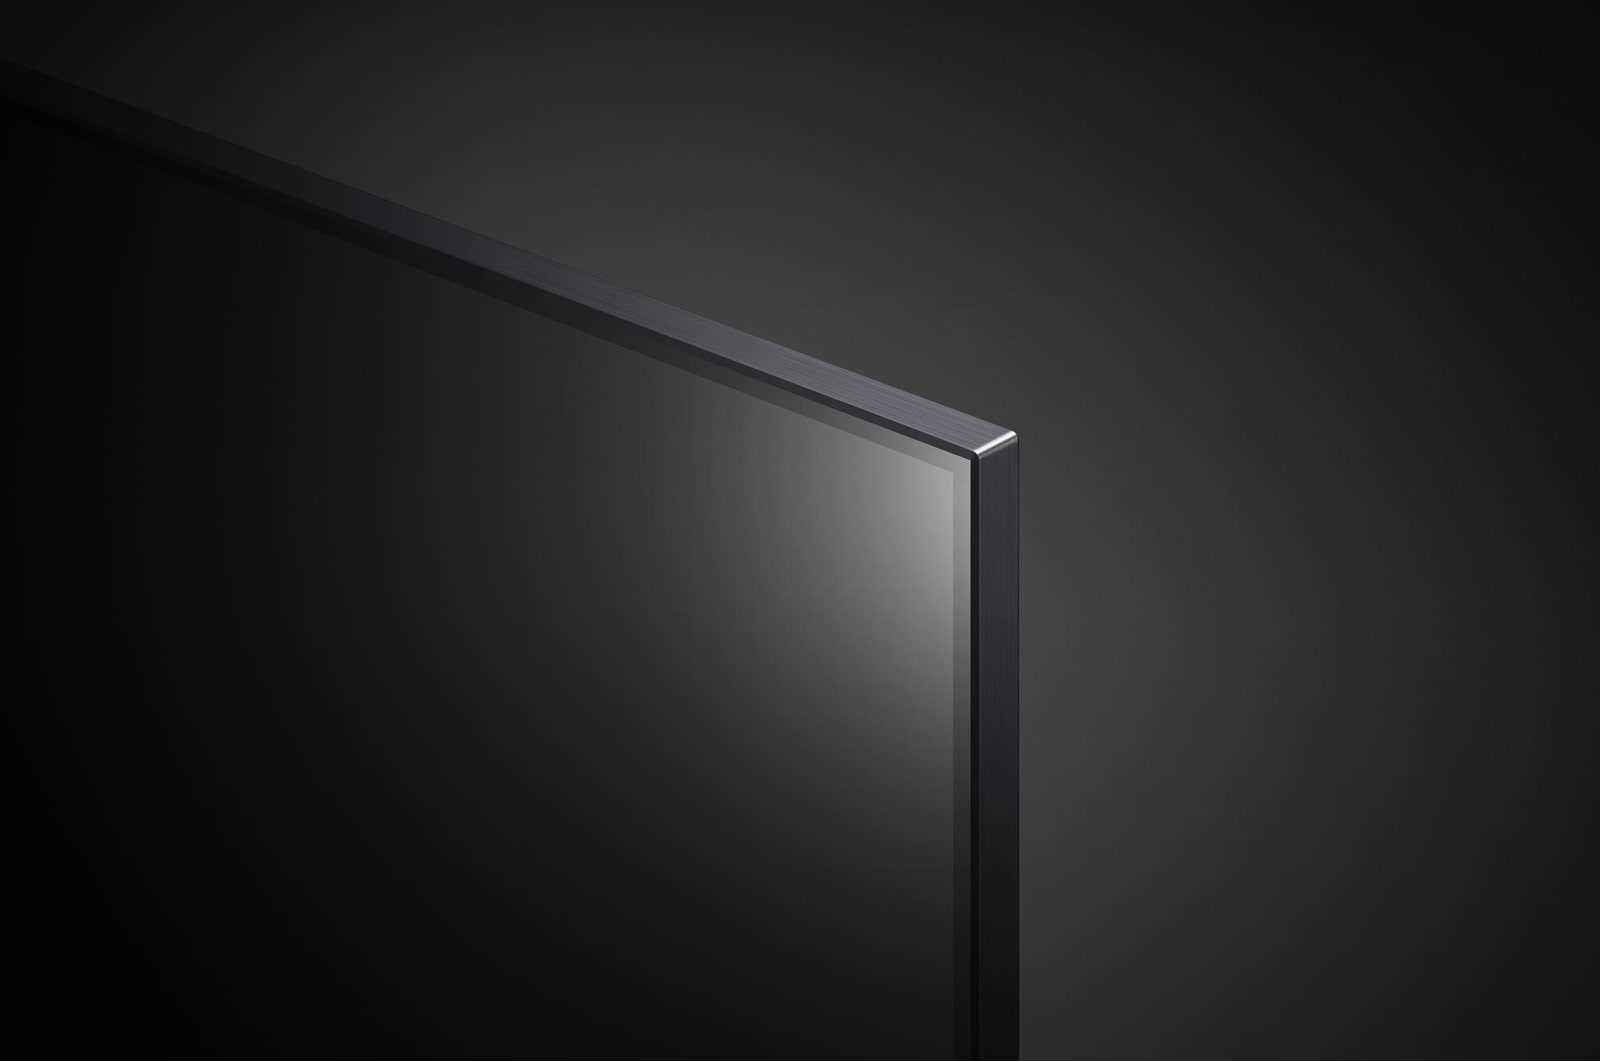 "LG 75NANO916PB   75"" LG NanoCell TV"